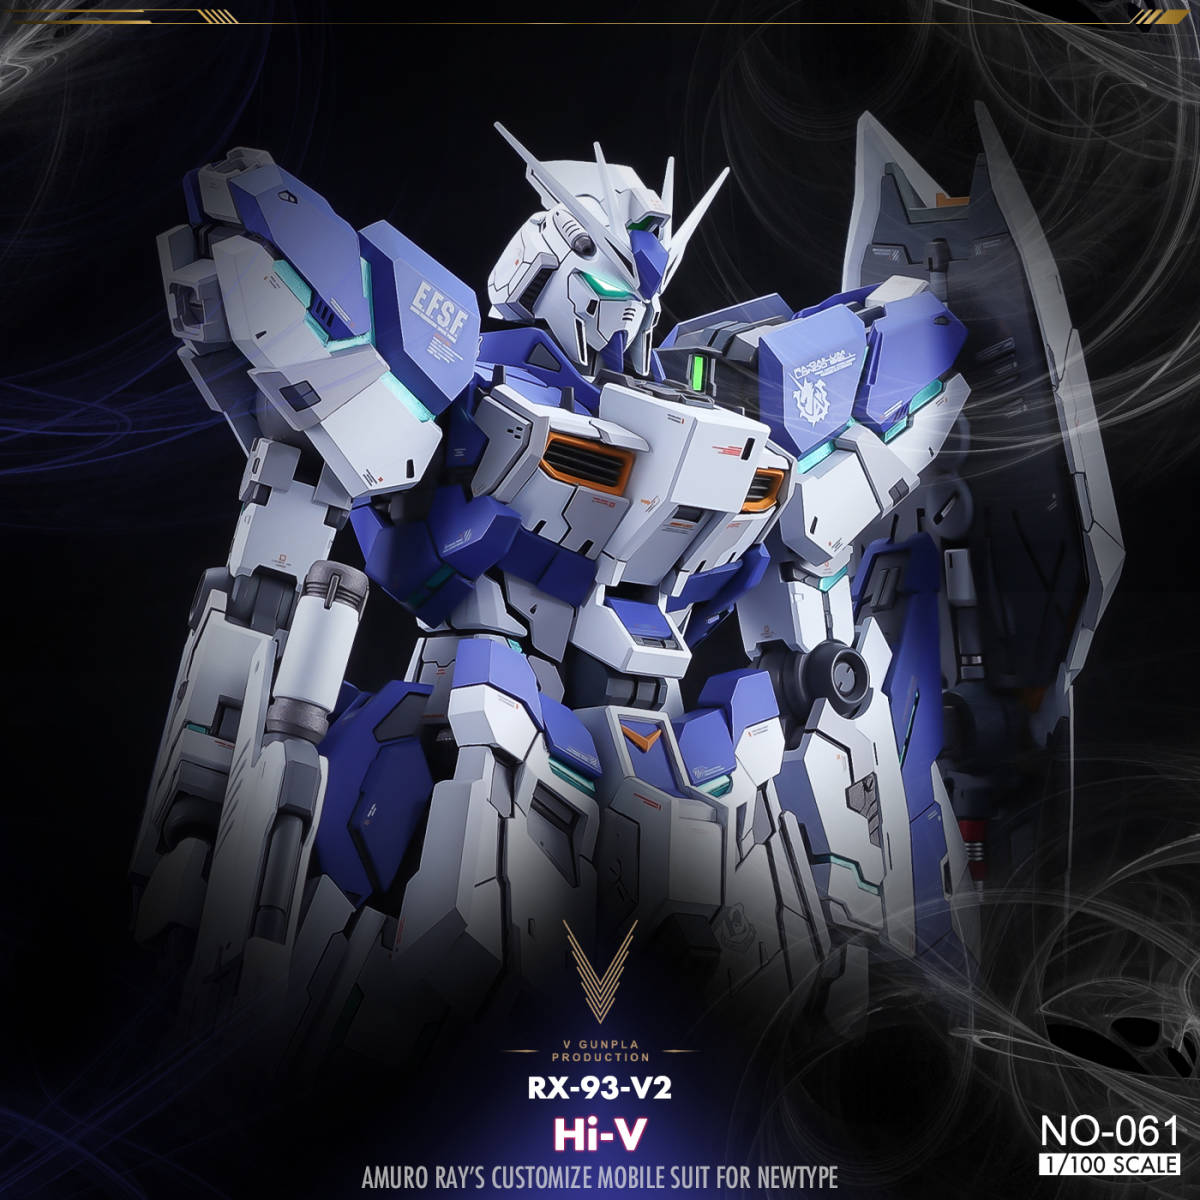 G620_AOK_MG_RX_93_nu_Hi_nu_008.jpg